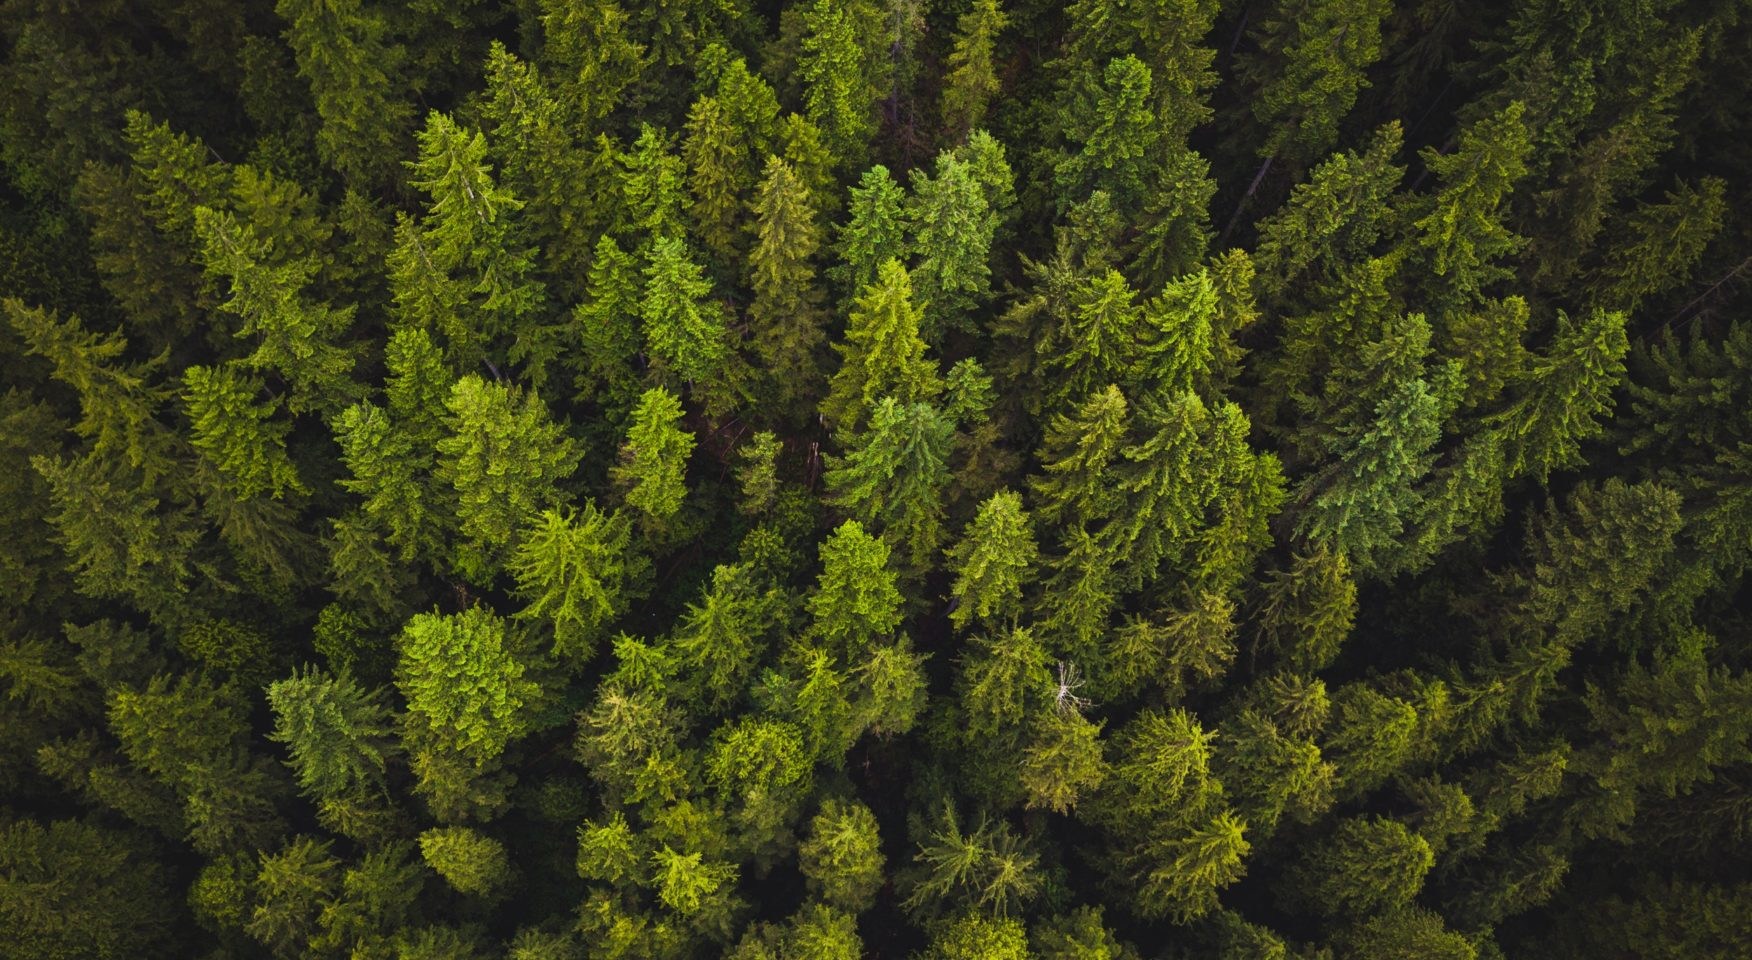 Evergreen treetops